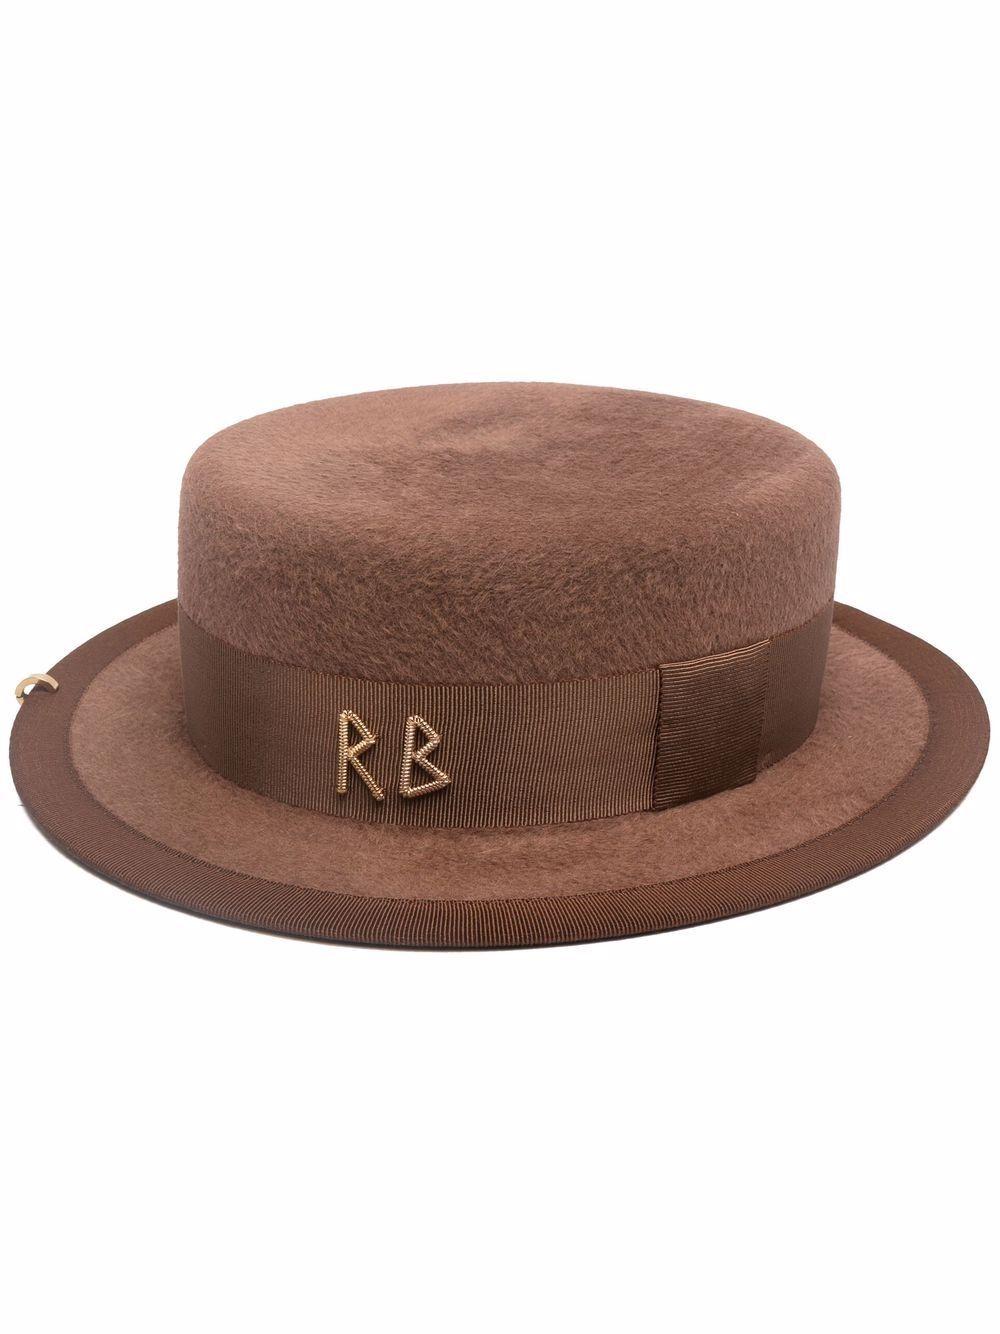 Cappello canotier in feltro